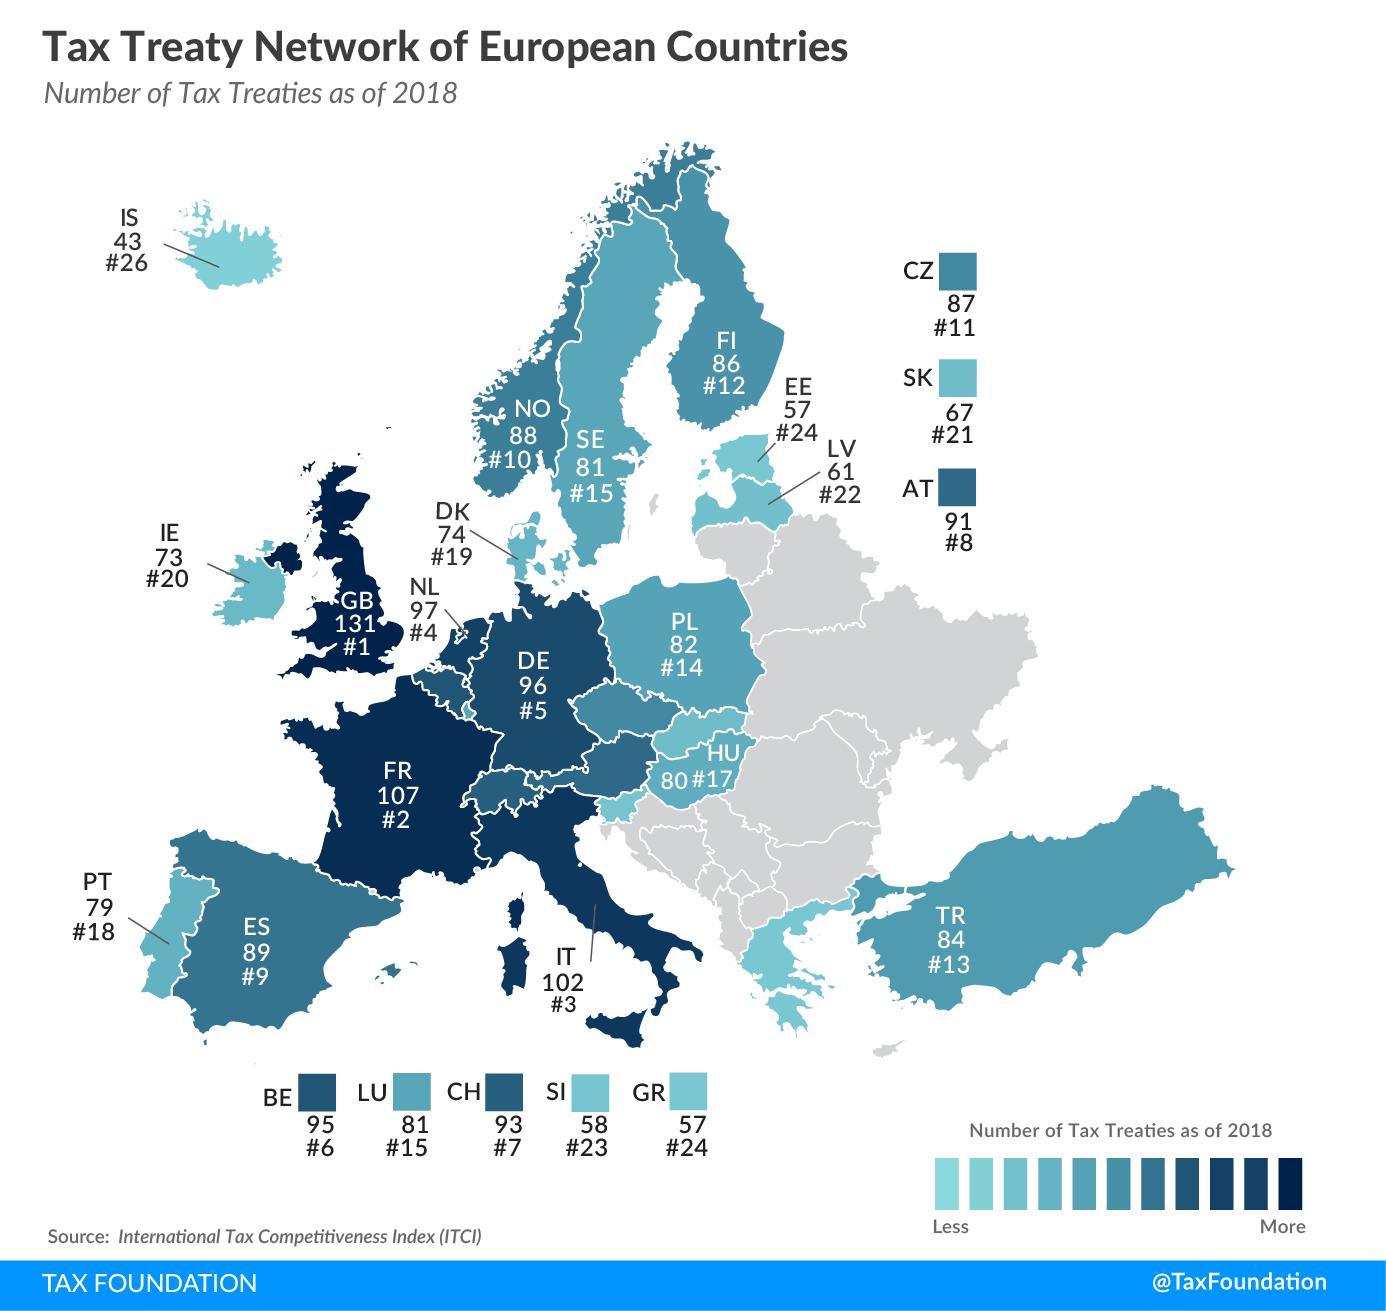 European tax treaty 2019 tax treaty network of european countries 2019